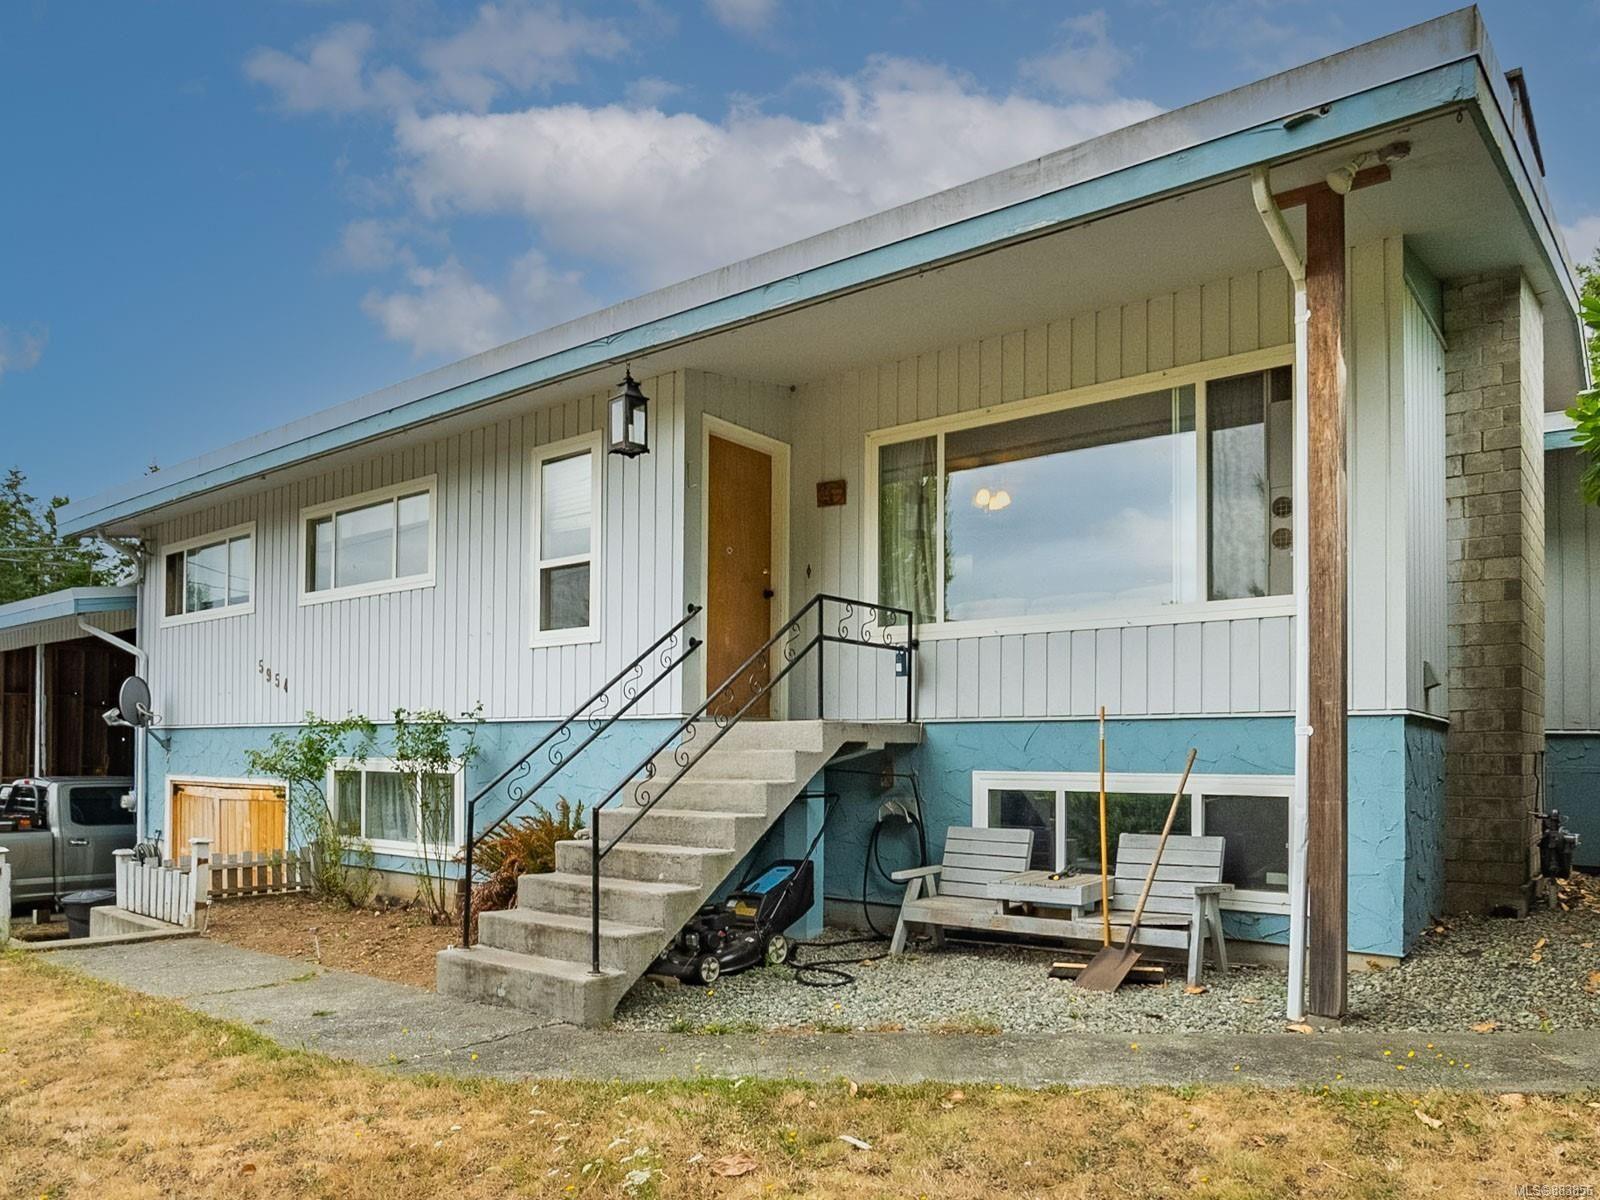 Main Photo: 5954 Becker Pl in : PA Alberni Valley House for sale (Port Alberni)  : MLS®# 883856